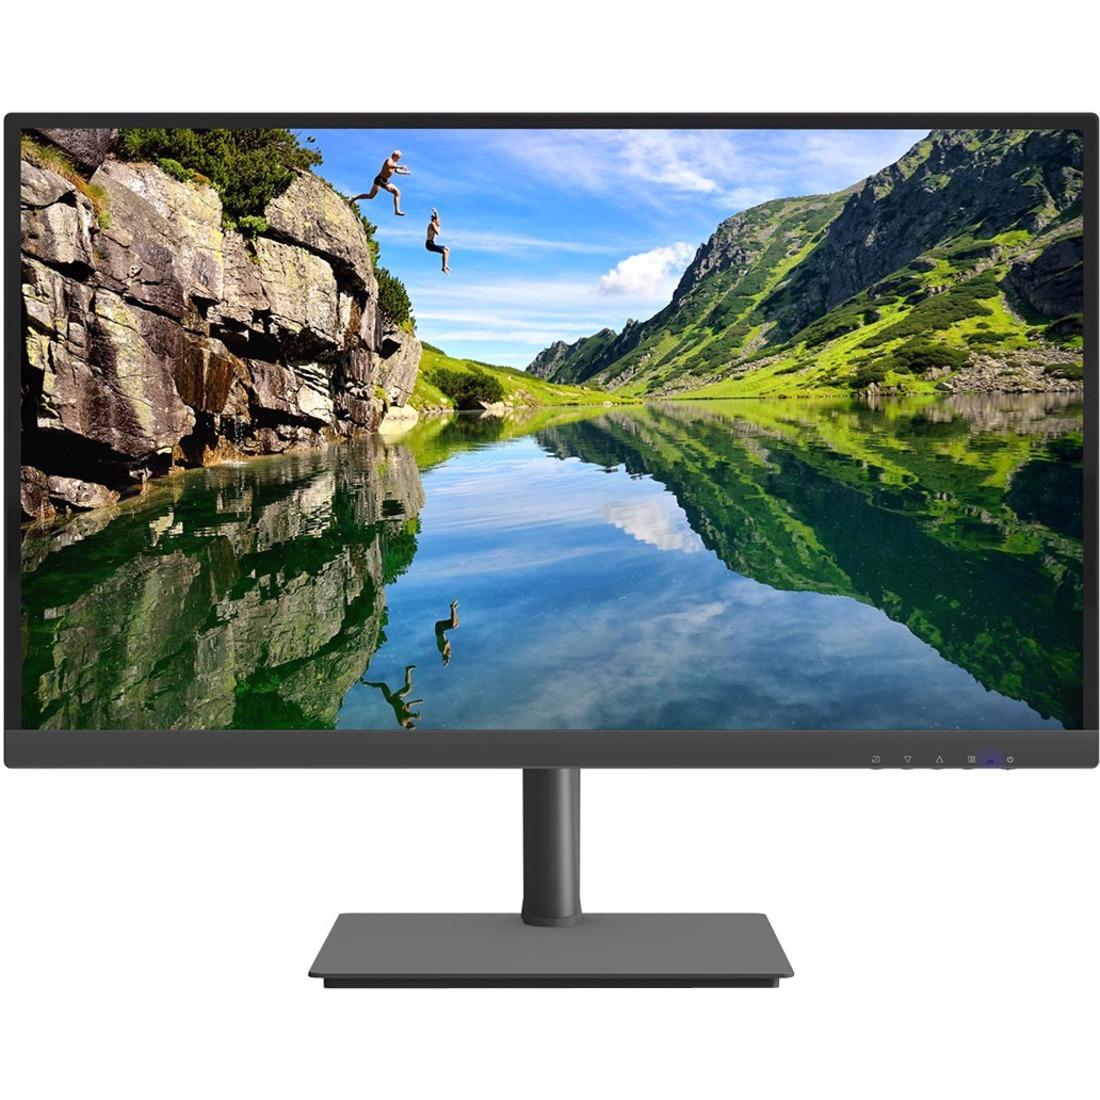 "Planar PXN2480MW 23.8"" Full HD LCD Monitor - 16:9 - Black_subImage_1"